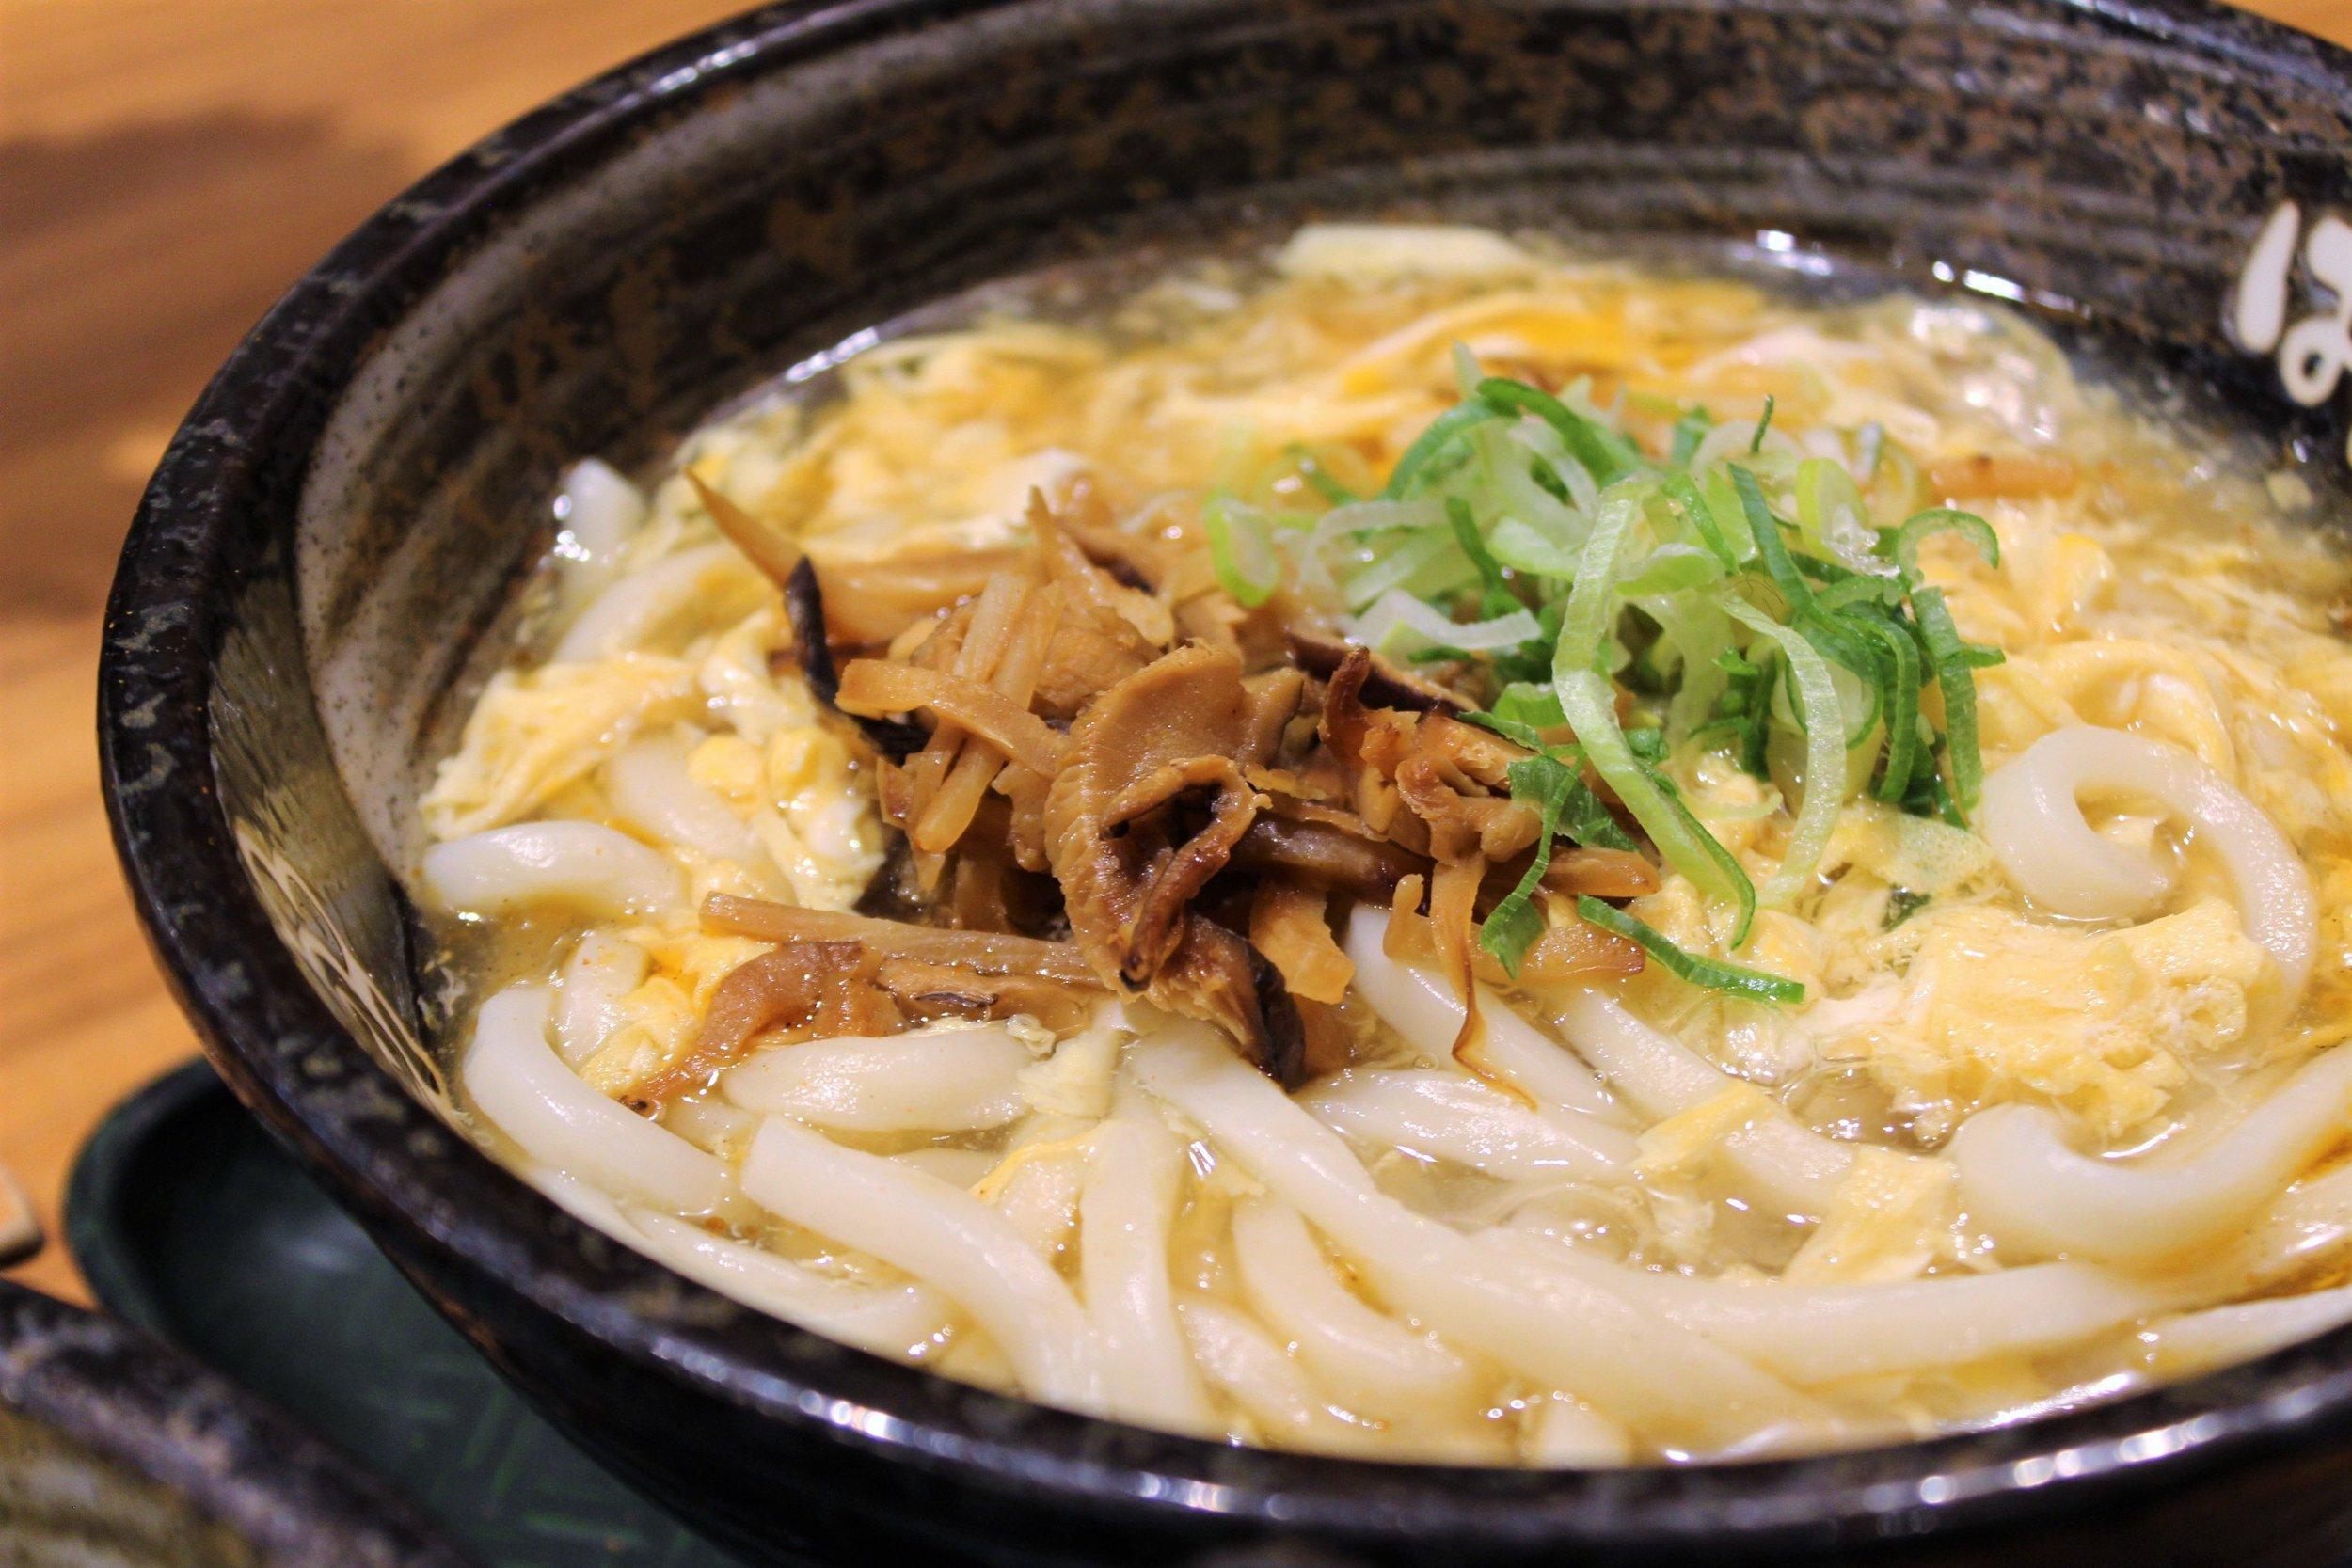 Hot and Sour Soup Vegetable Udon at Sanuki Udon Hanamaru in Shibuya, Japan